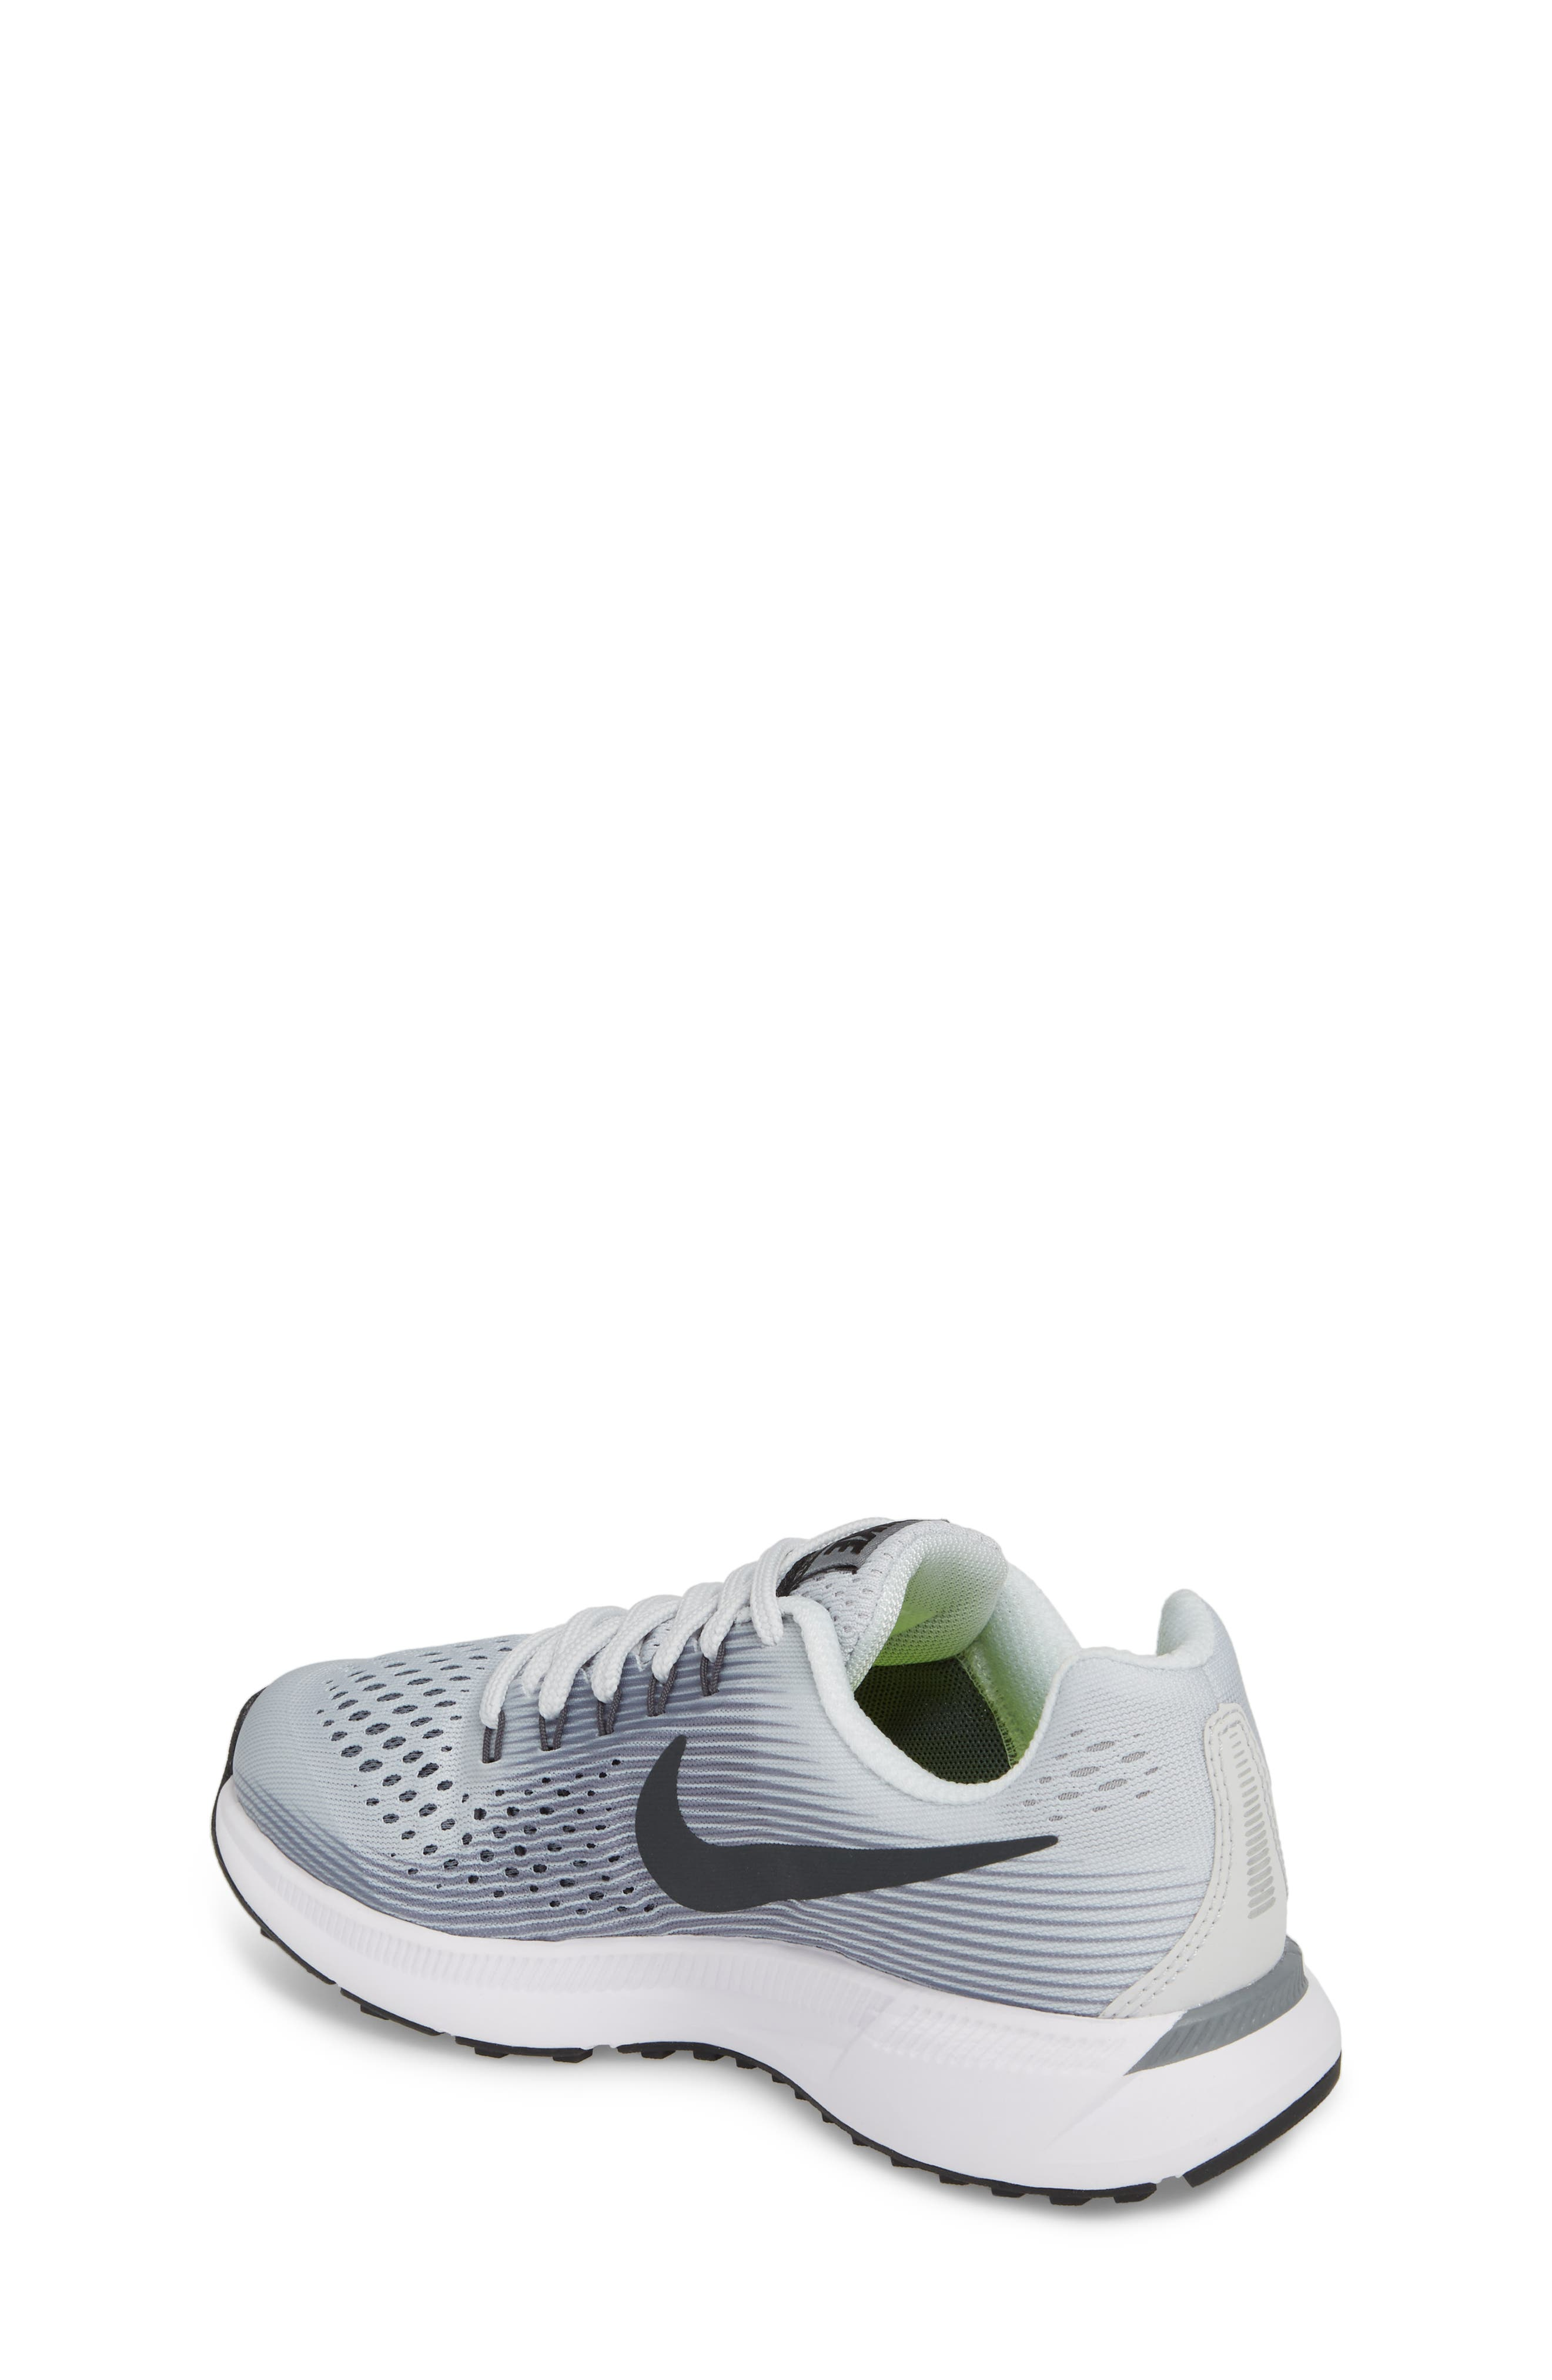 Zoom Pegasus 34 Sneaker,                             Alternate thumbnail 2, color,                             Platinum/ Anthracite/ Grey